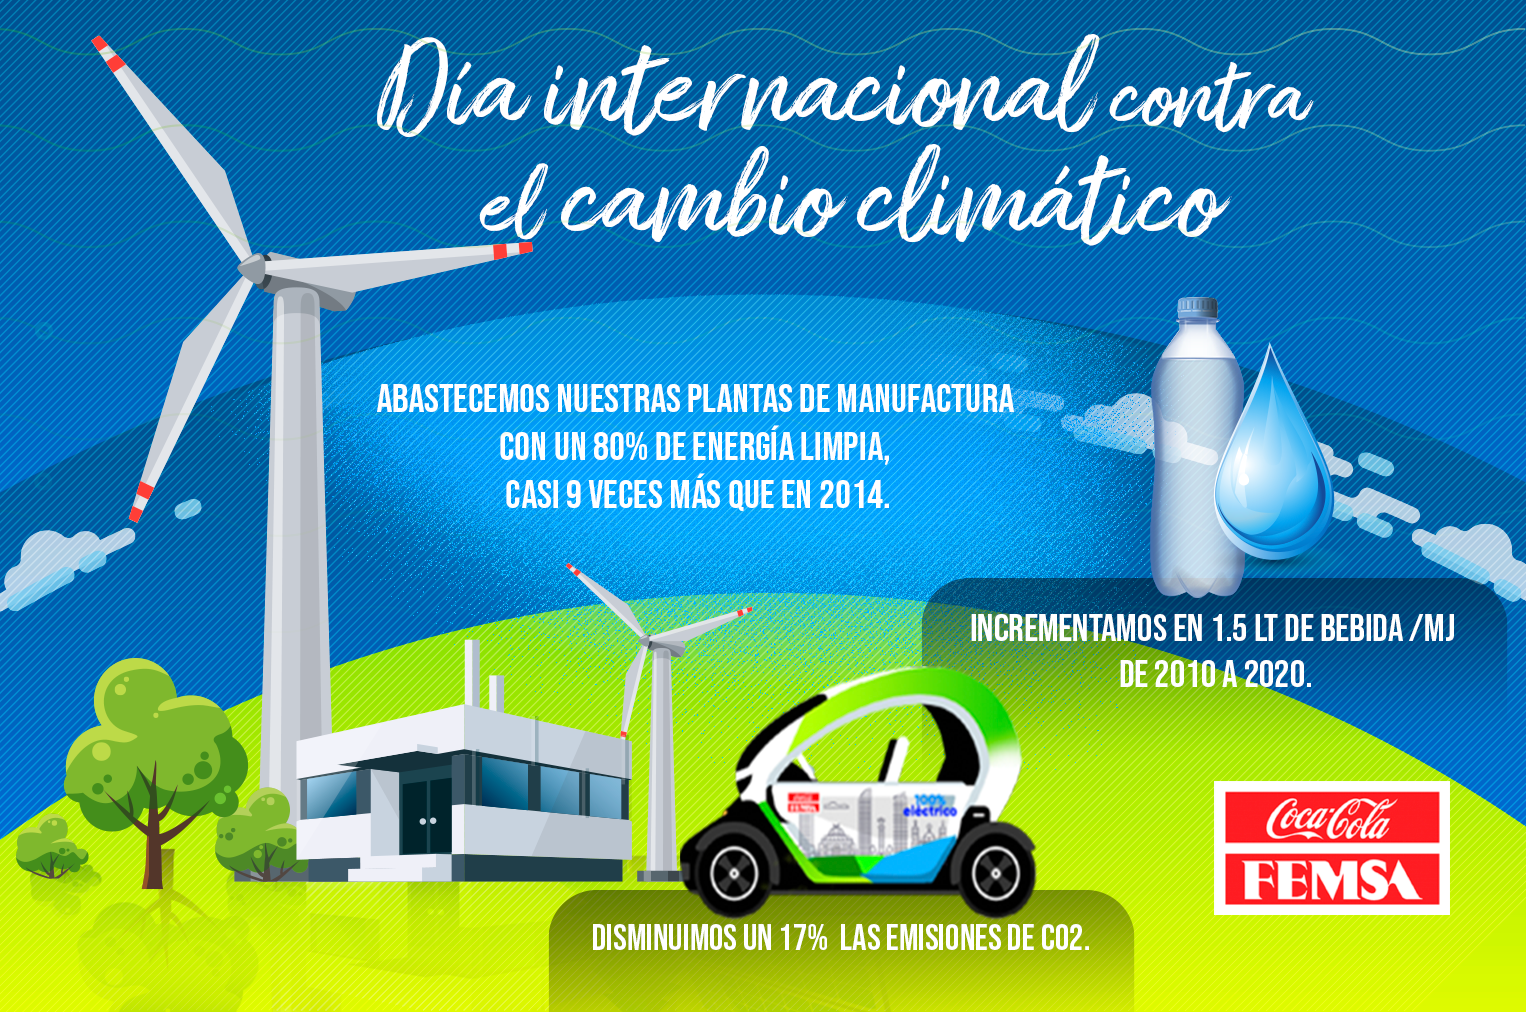 Coca-Cola FEMSA, acciona con firmeza frente al climático.